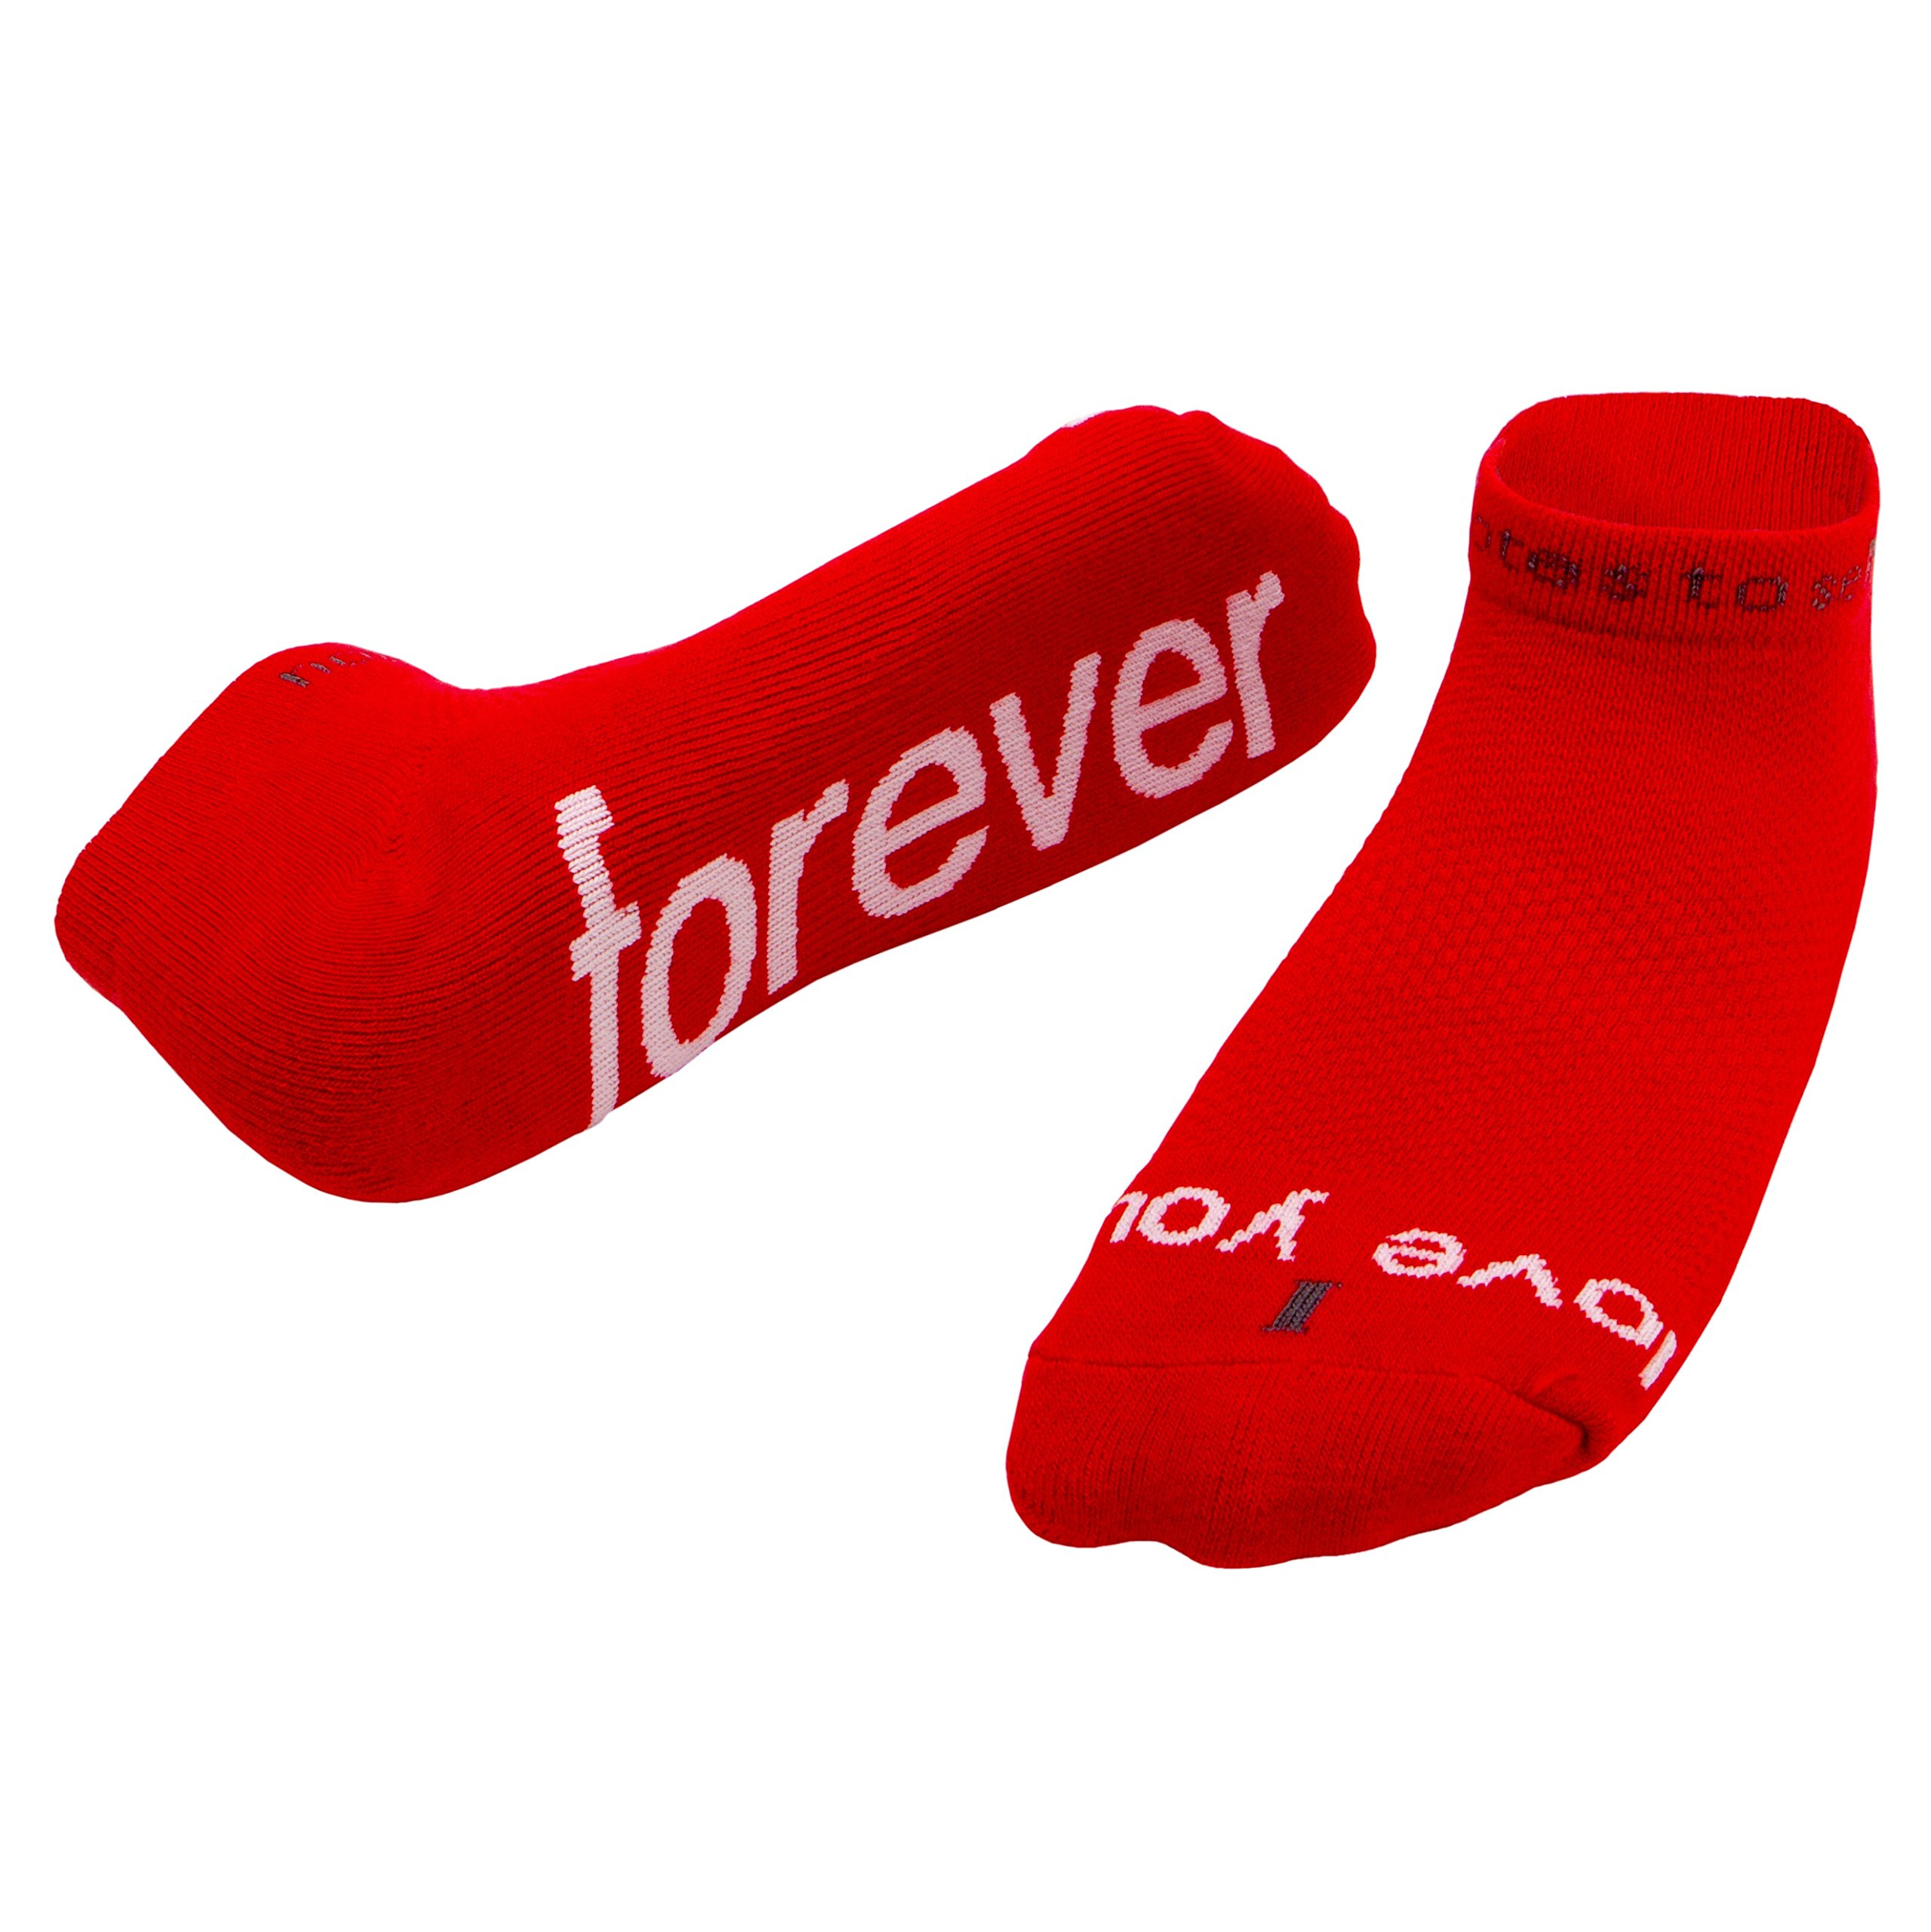 Notes to Self Socks - Daily Affirmations, Inspirational Socks for Women & Men